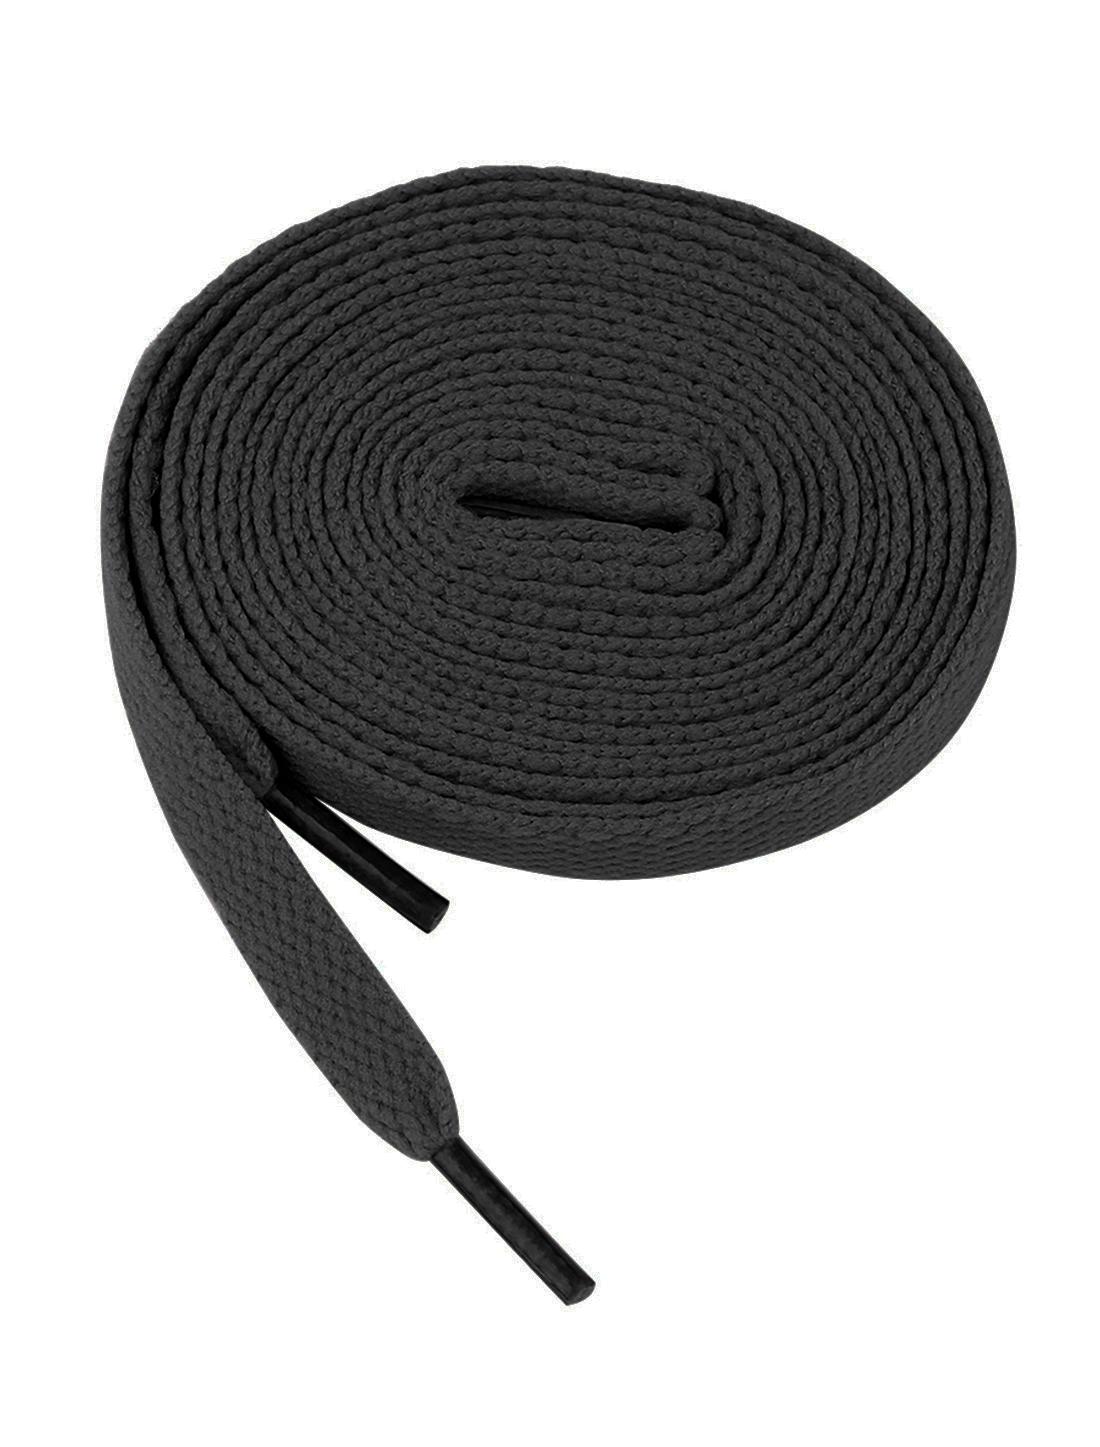 Unisex Cotton Blends Sneakers Flat Bootlaces Shoelaces Black 2 Pairs